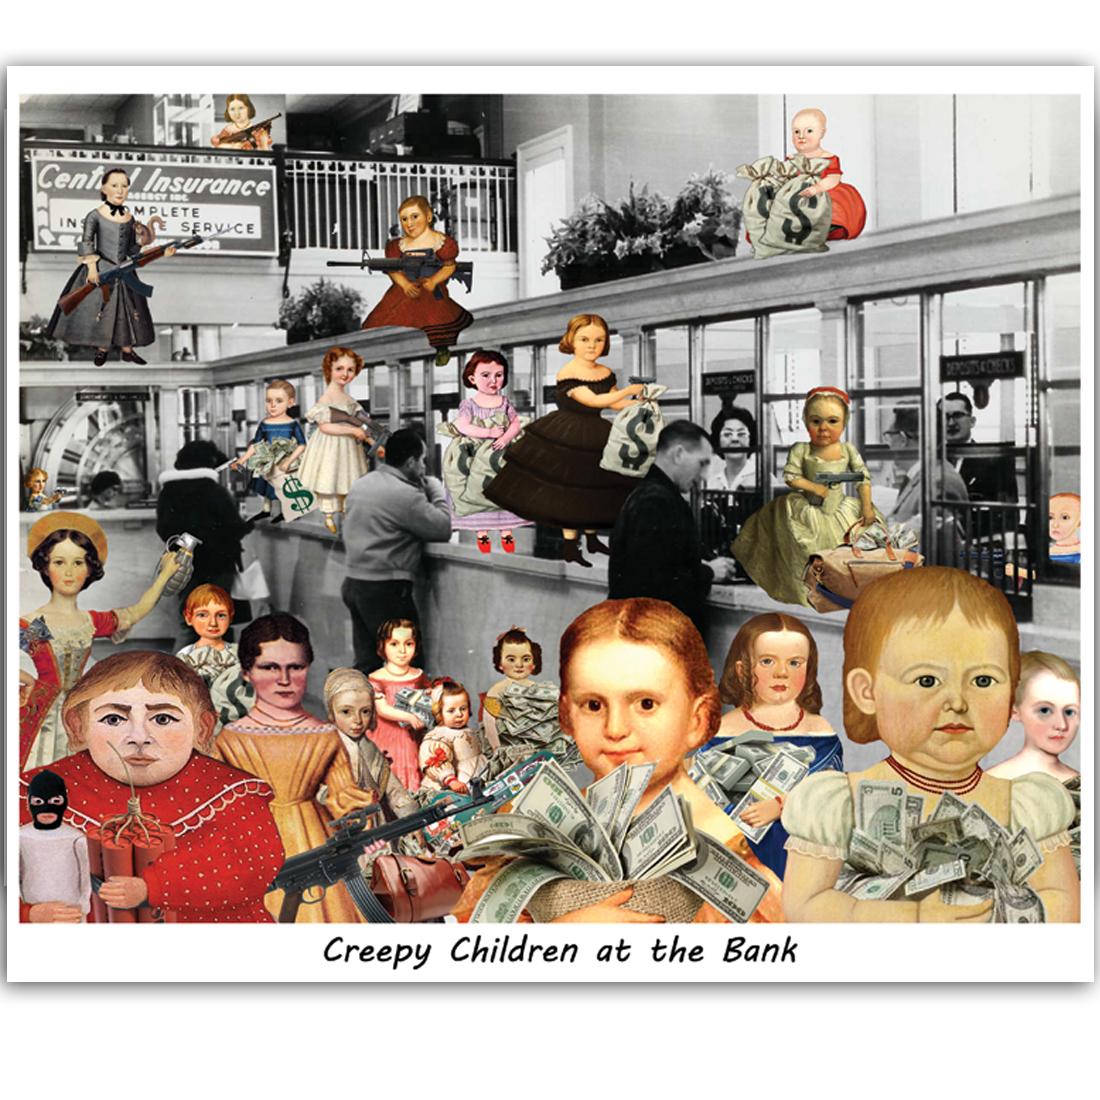 Creepy Children at the Bank